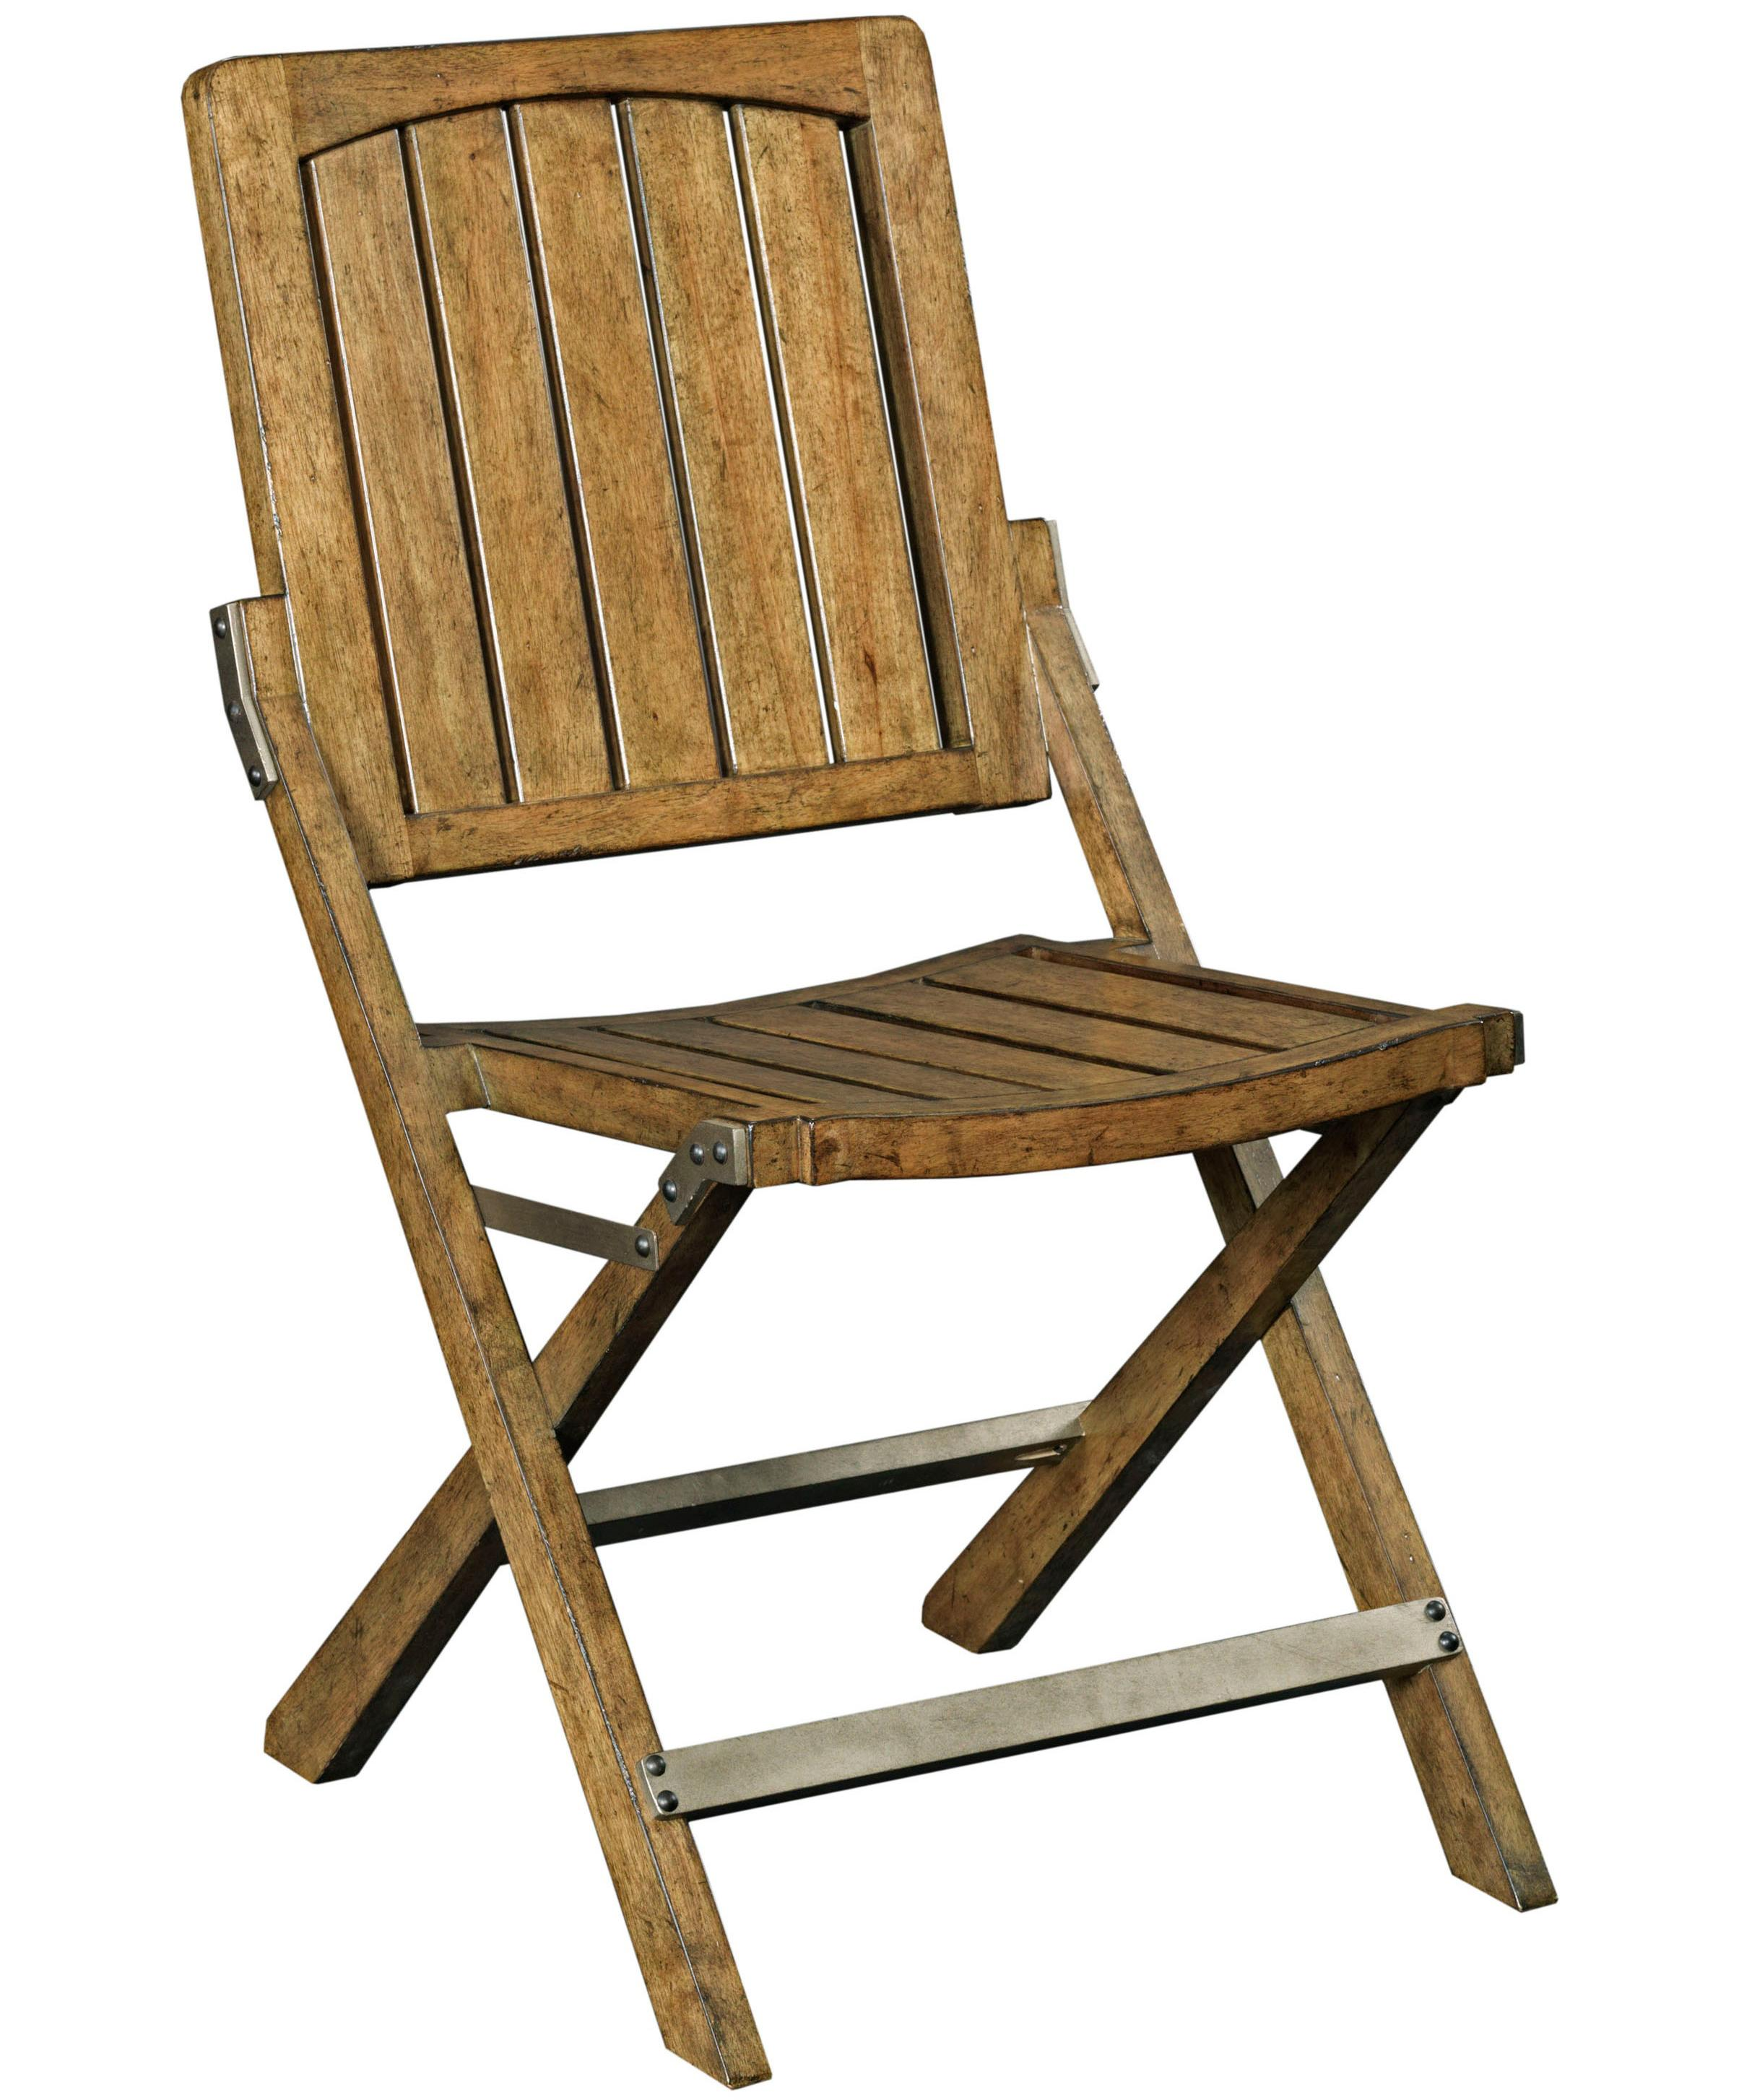 Broyhill Furniture New Vintage Cafe Wood Slat Chair - Item Number: 4808-583